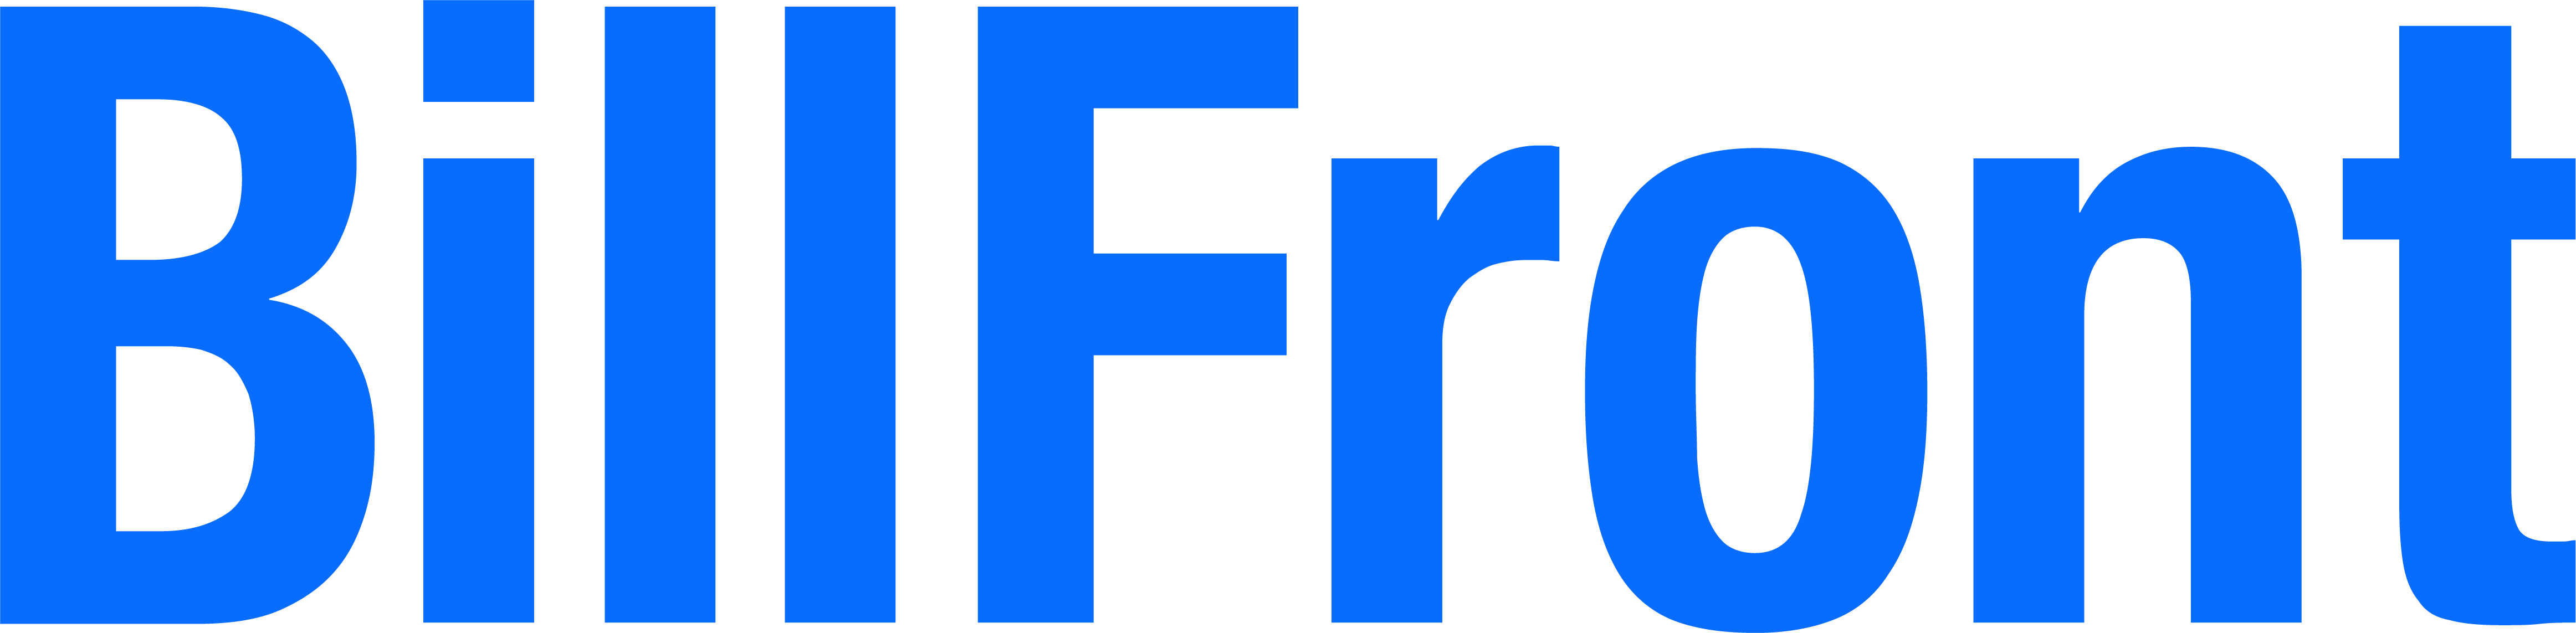 232141 billfront logo blue rgb c4ac1a original 1481629014